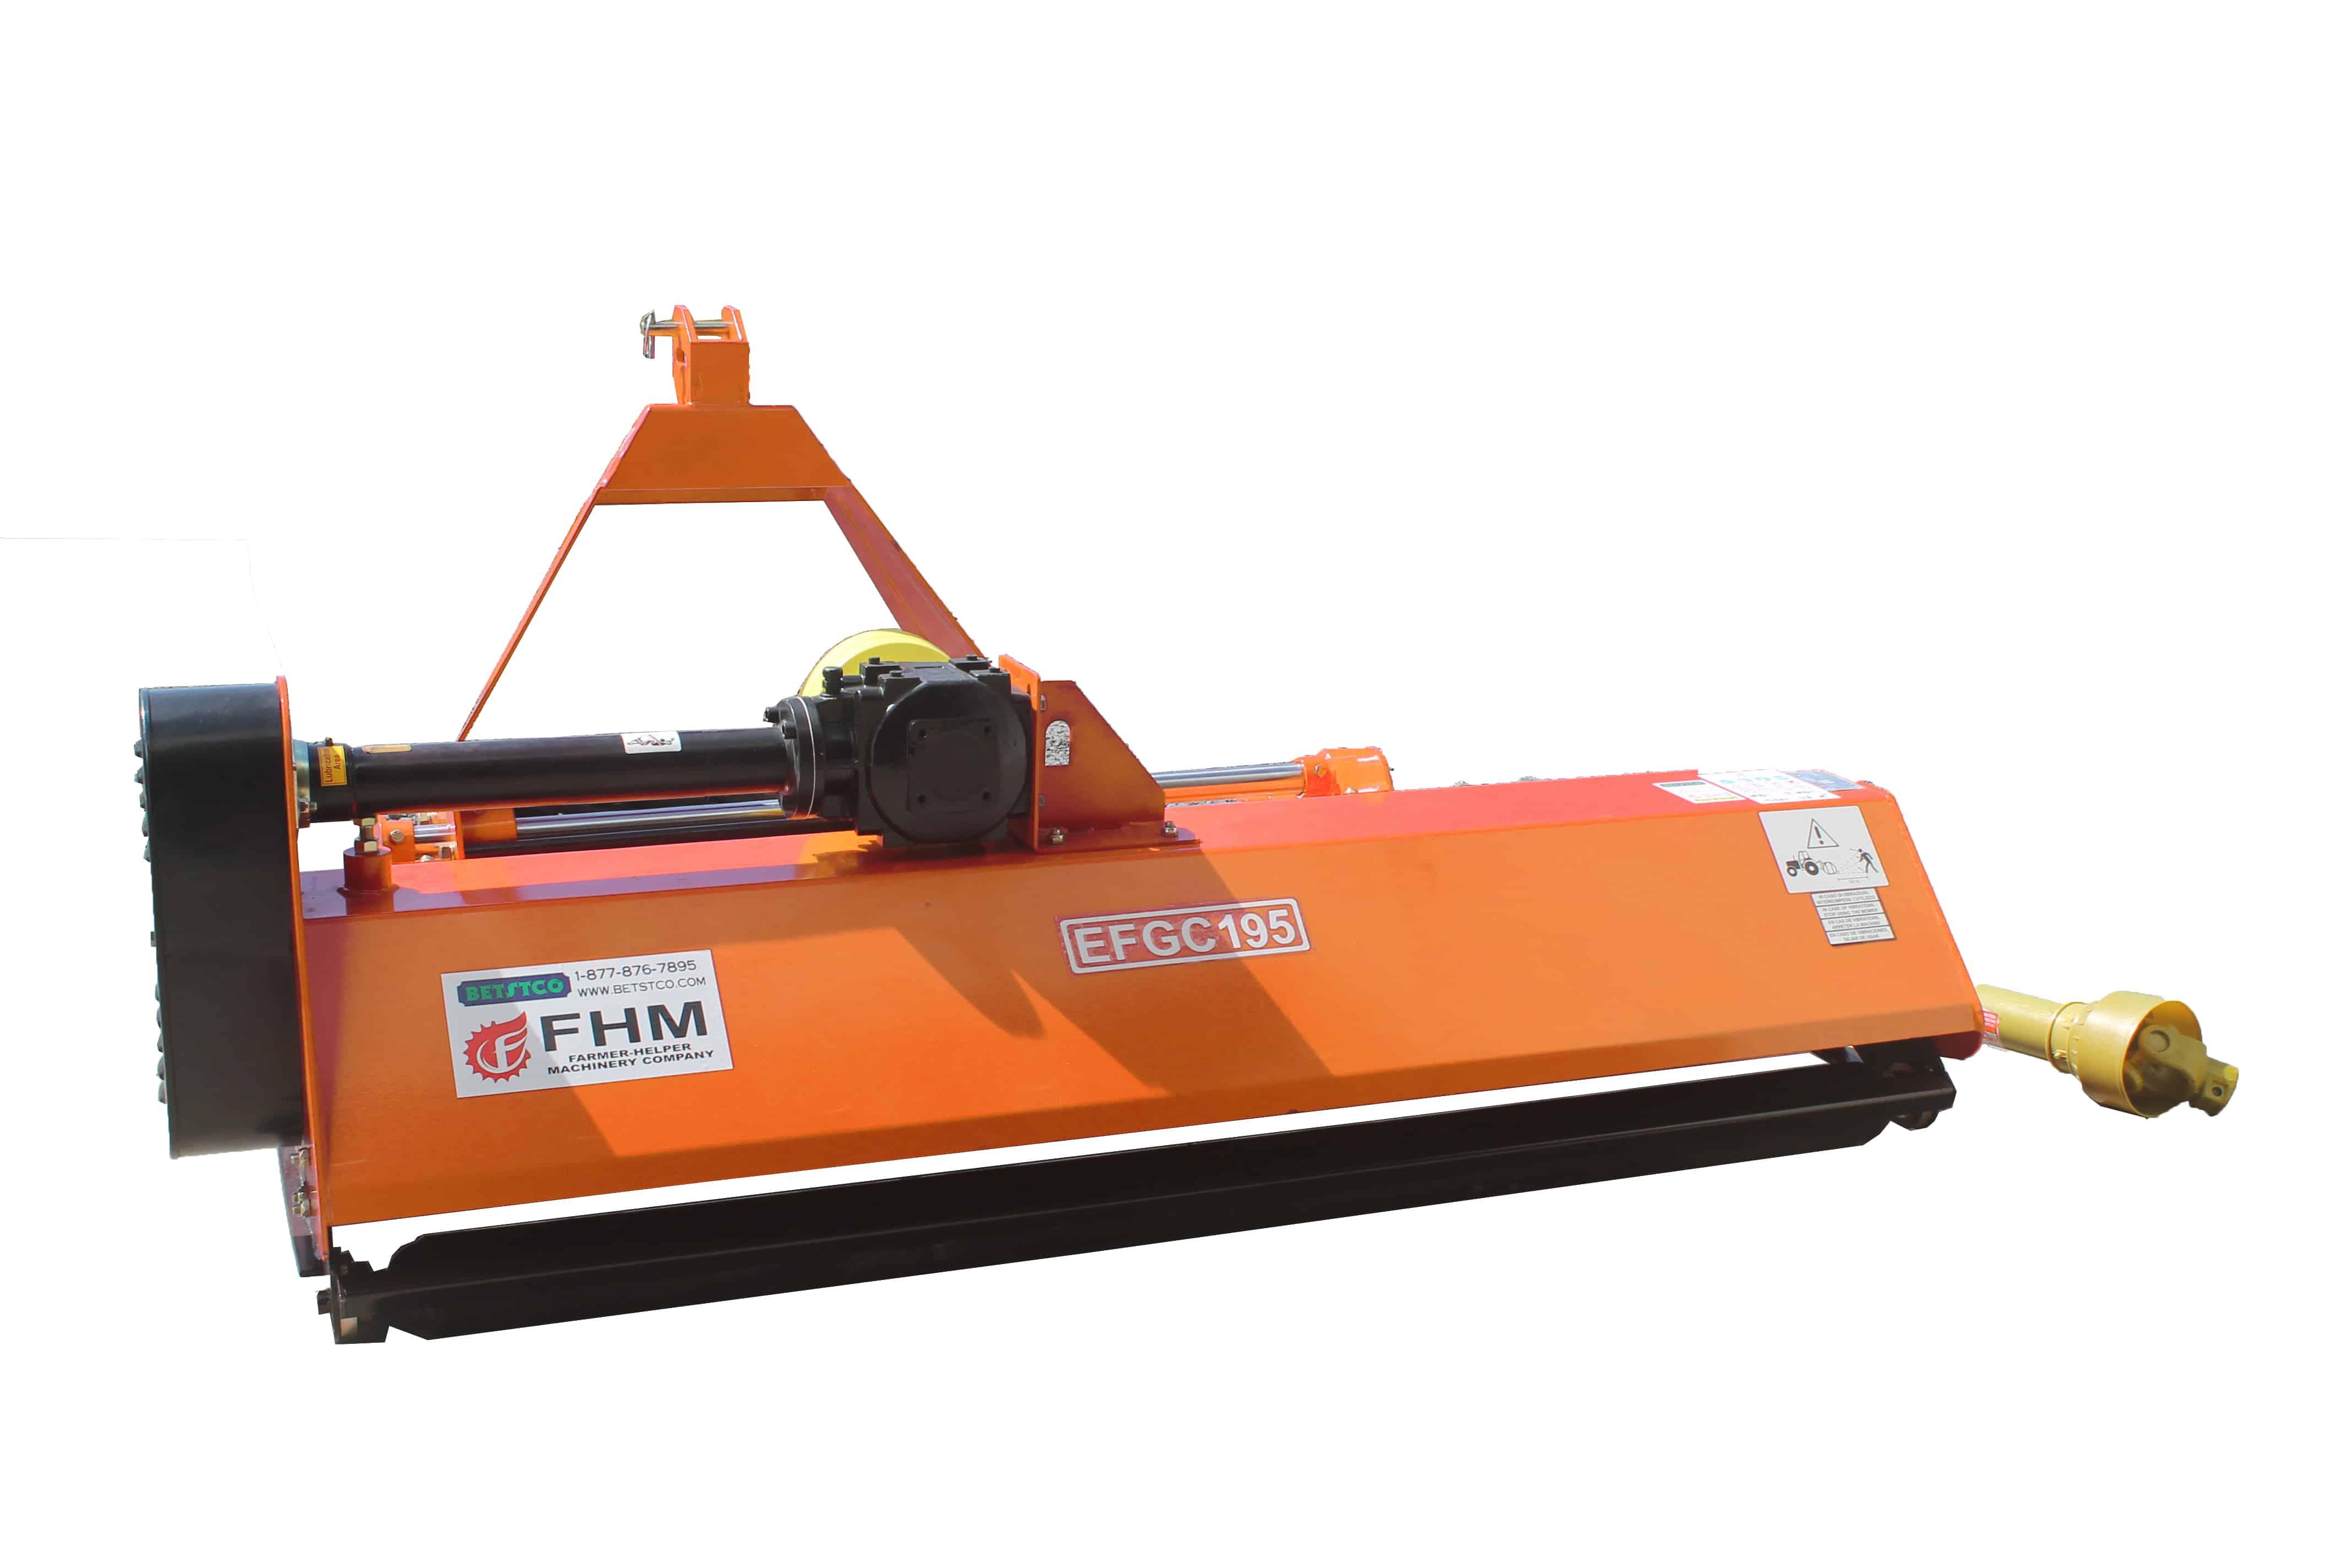 77 Quot Cut Heavy Duty Hydraulic Offset Flail Mower Fh